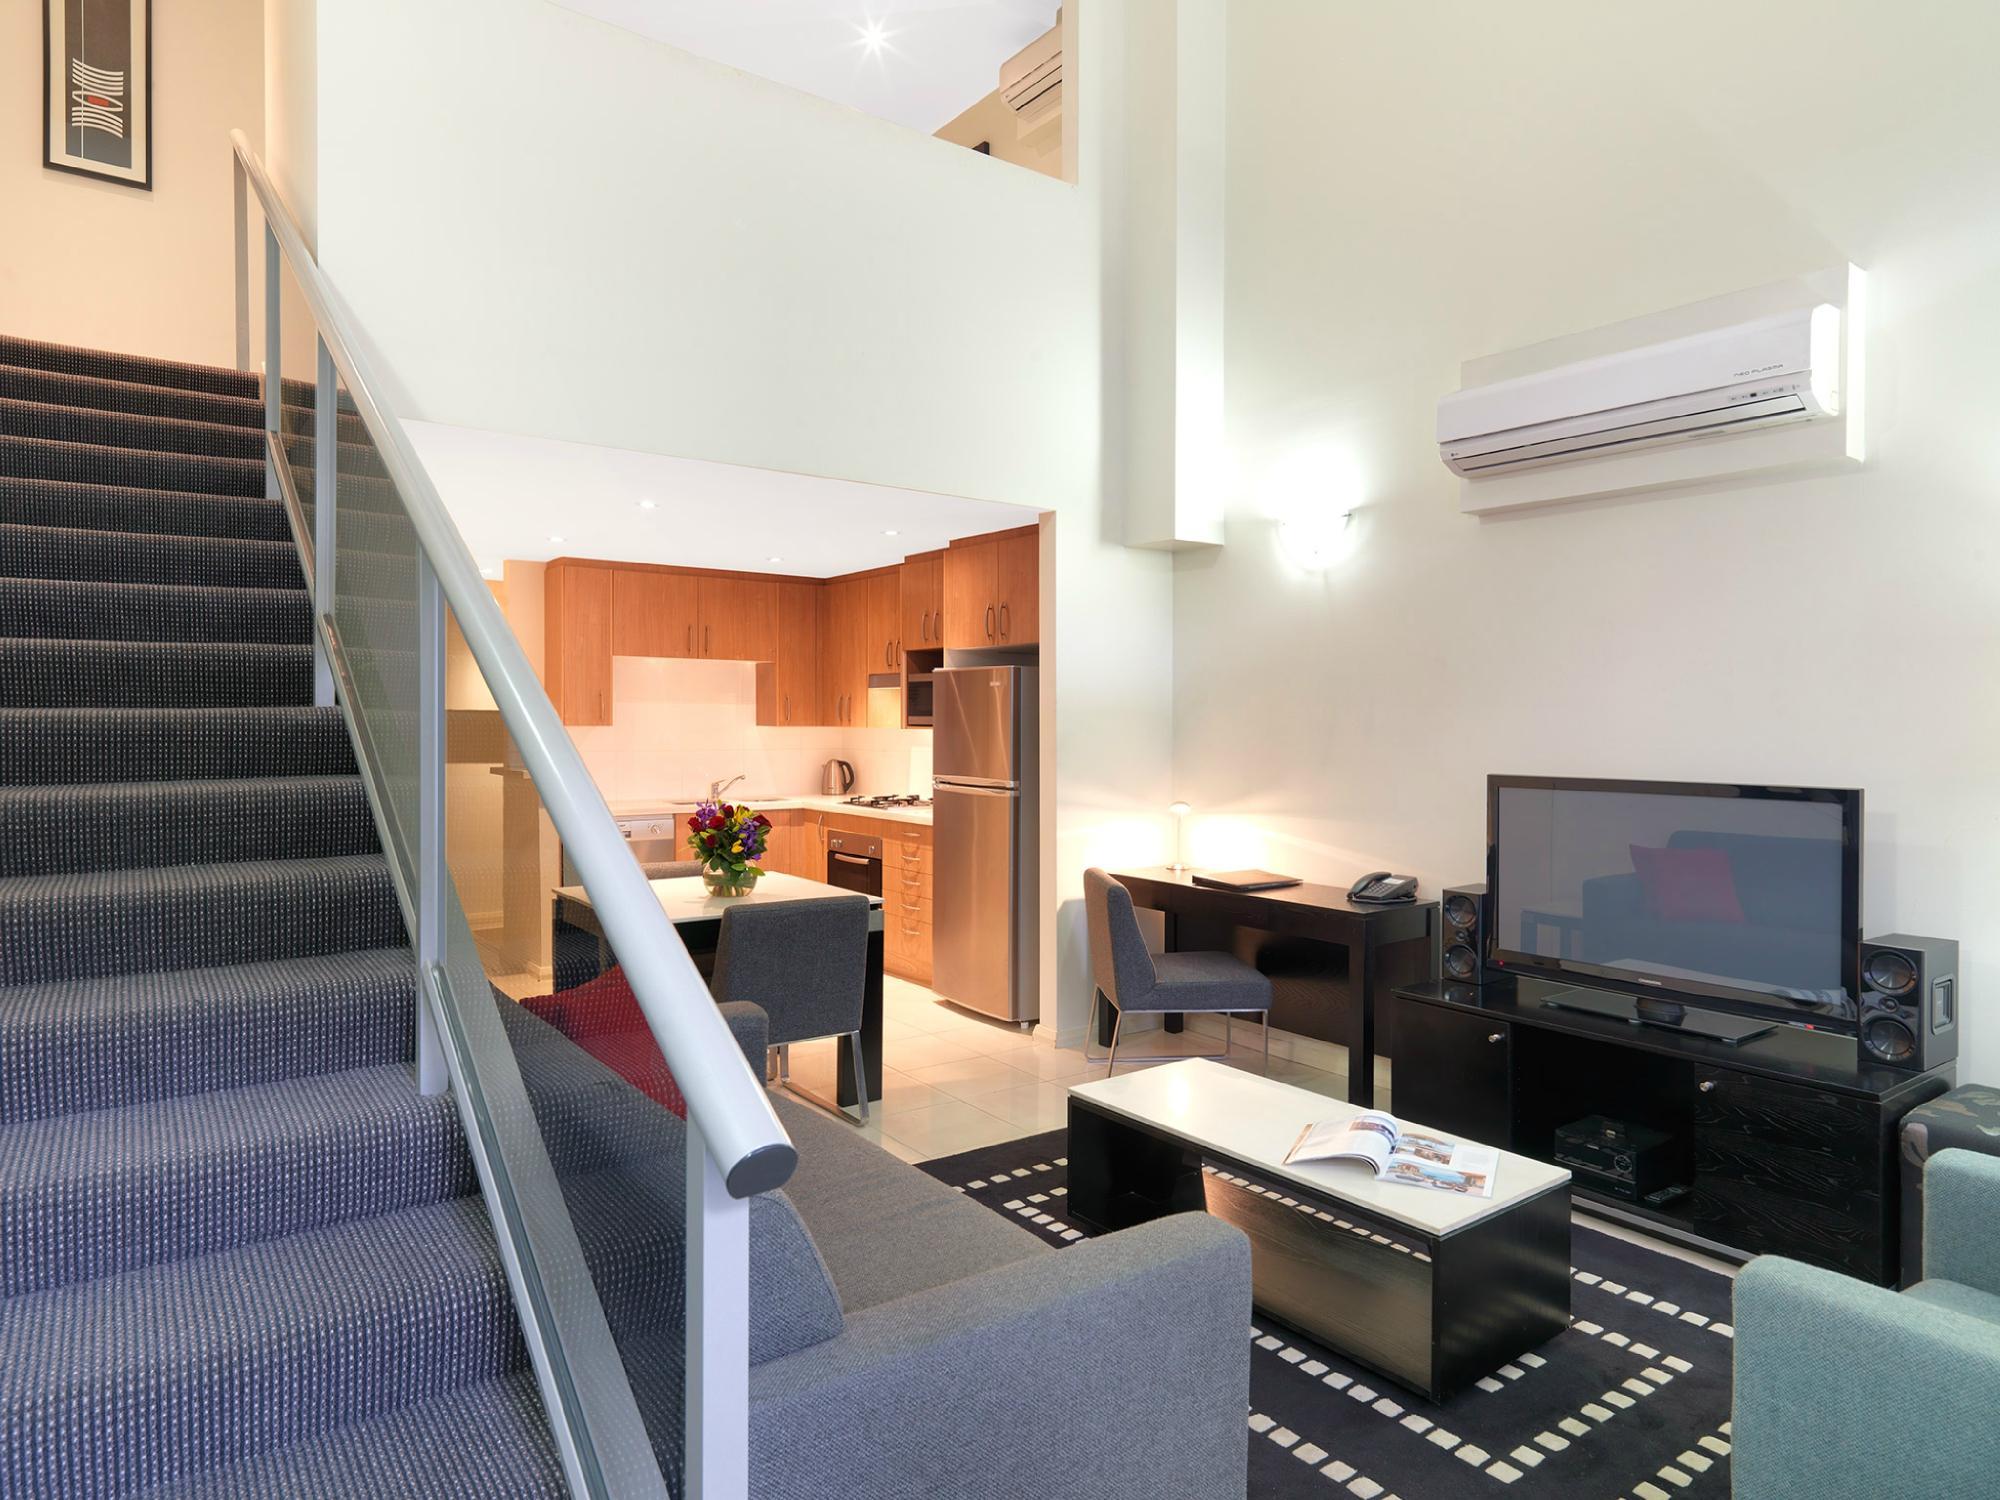 Meriton Serviced Apartments Danks Street, Waterloo